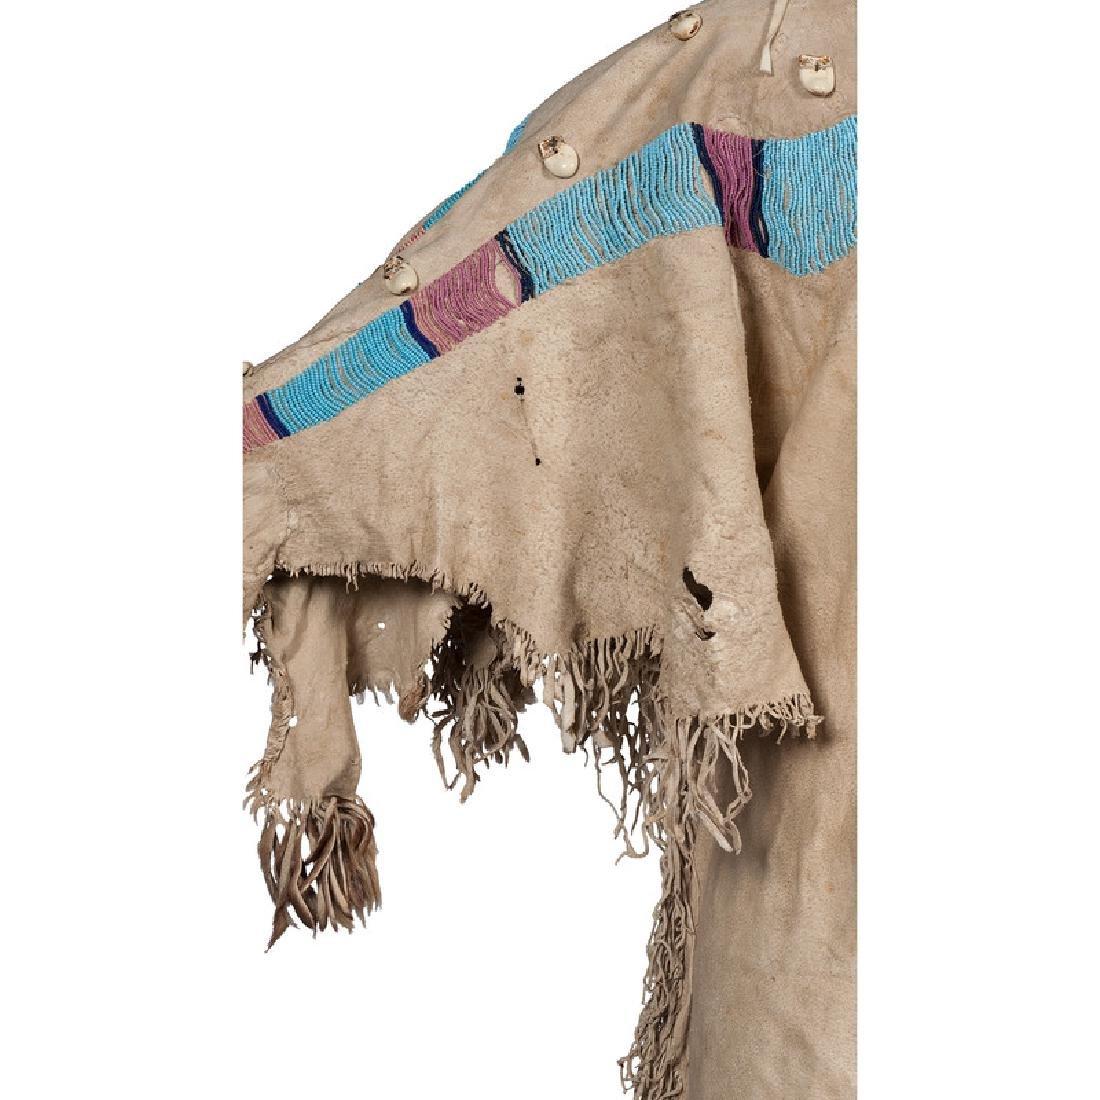 Nez Perce Beaded Hide Dress - 4